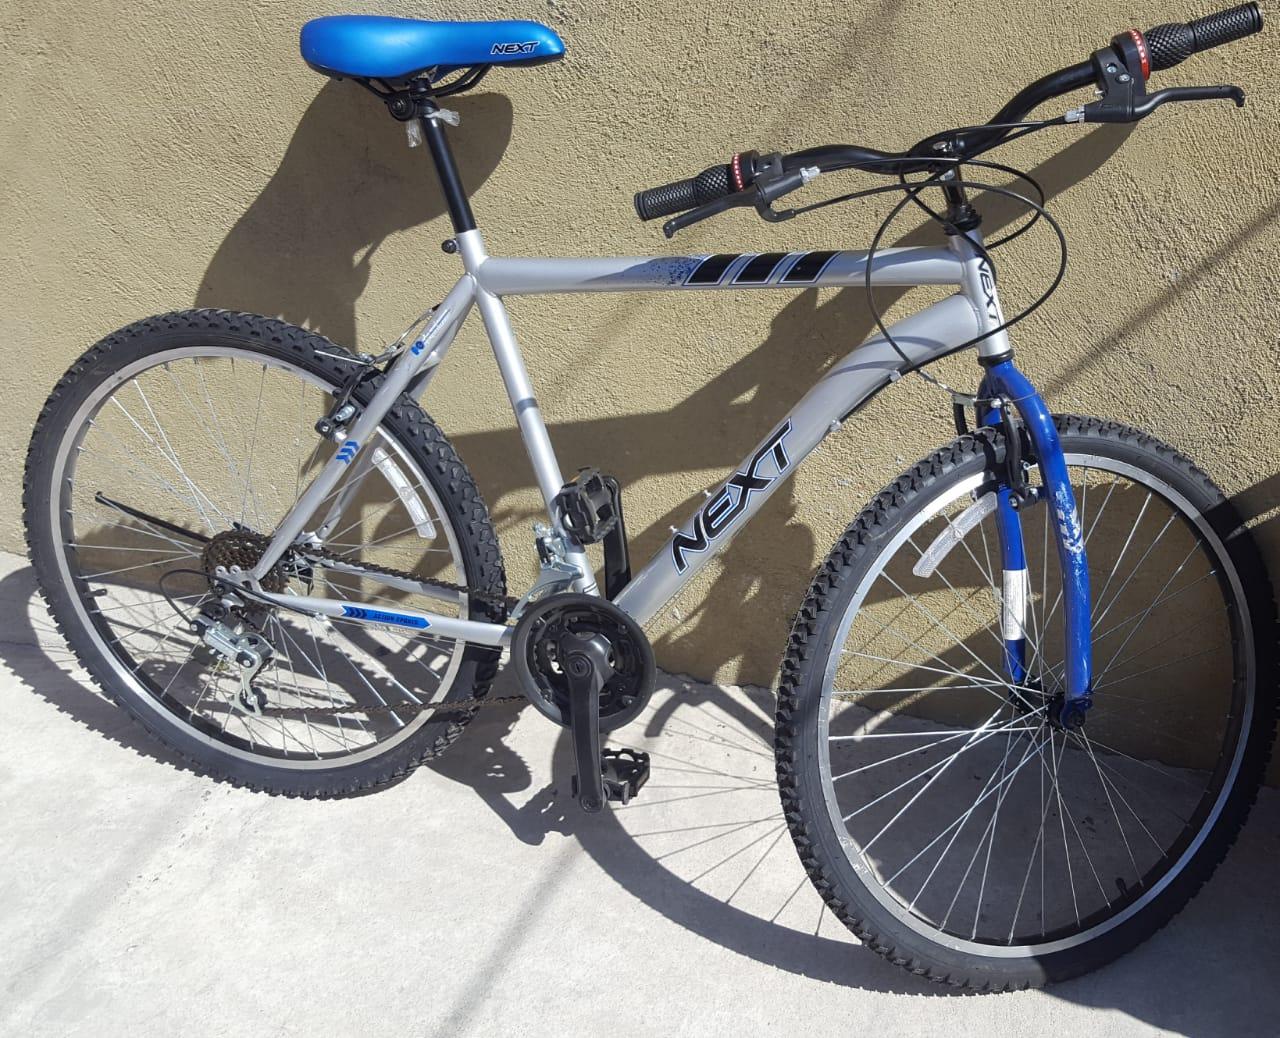 Bodega Aurrera: Bicicleta R26 $328.01